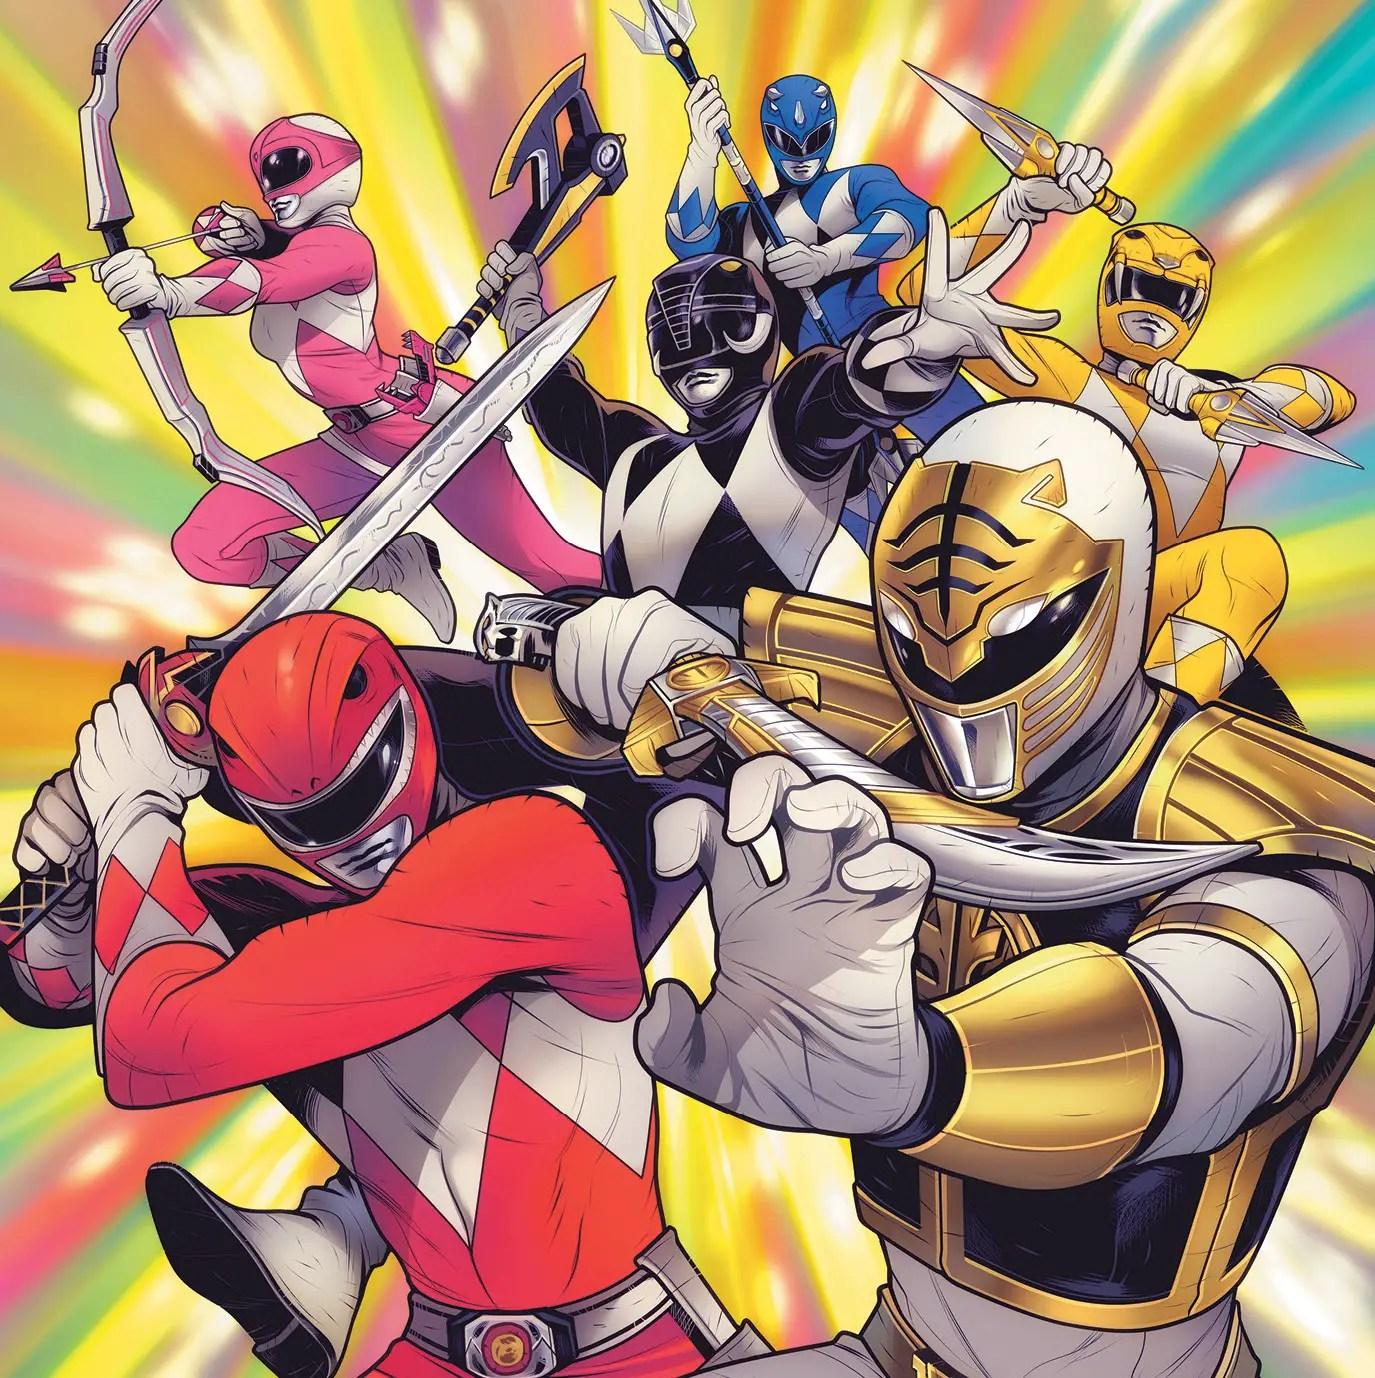 'Mighty Morphin' #11 is good ensemble comics